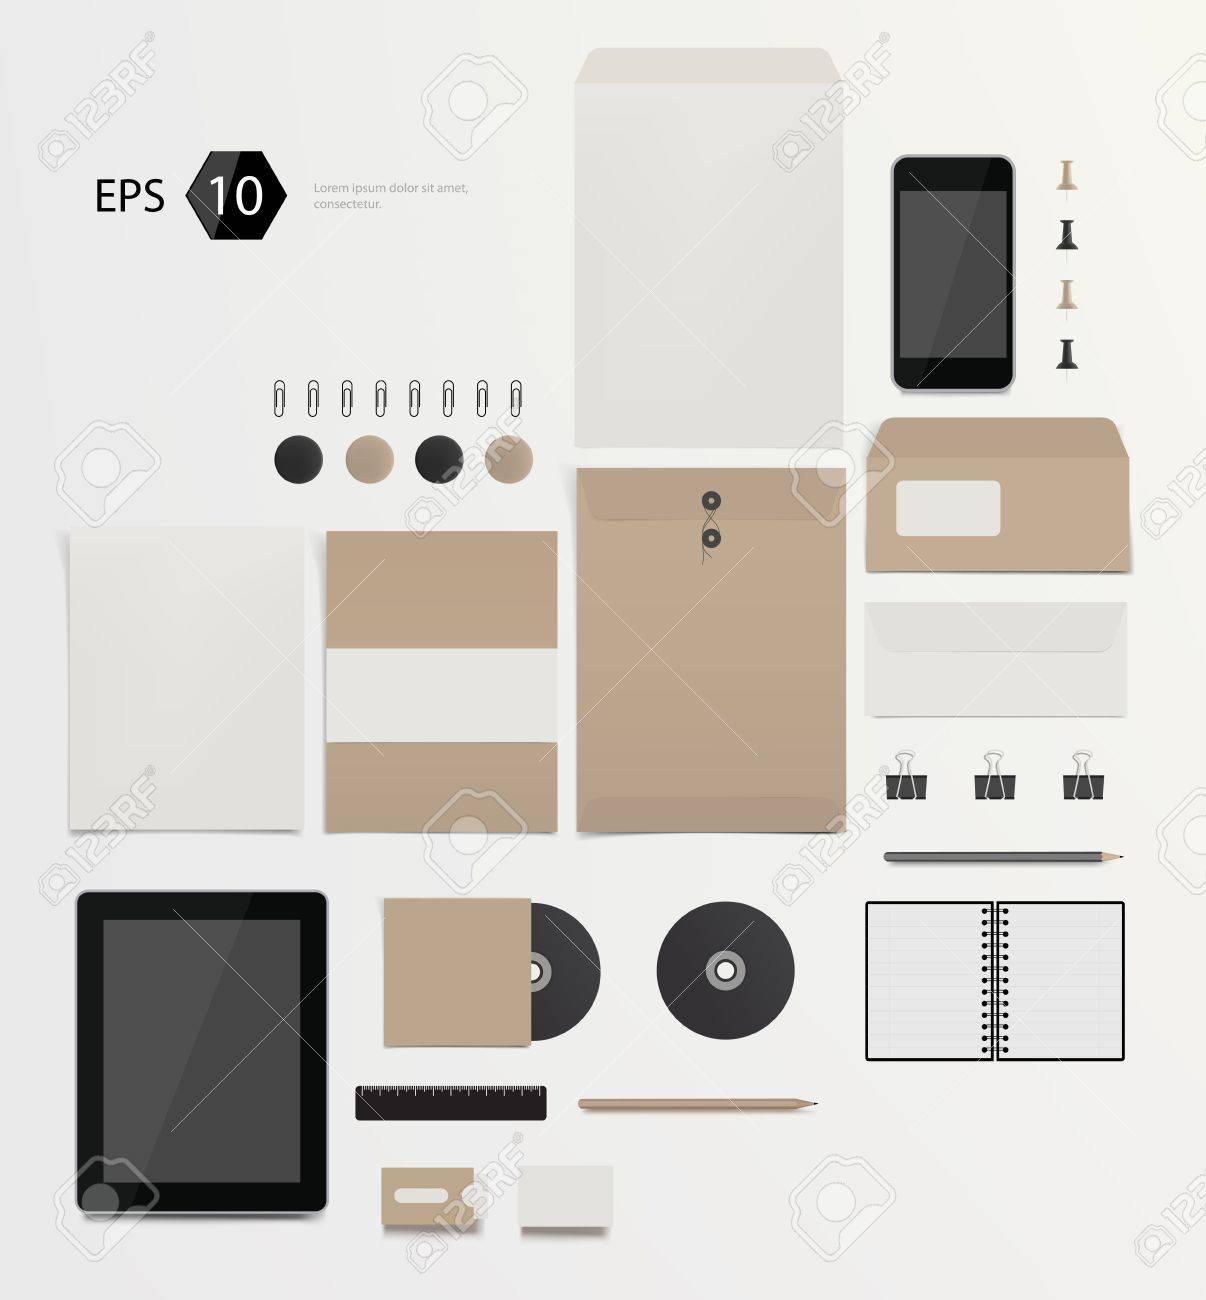 company corporate style template design Stock Vector - 21660947